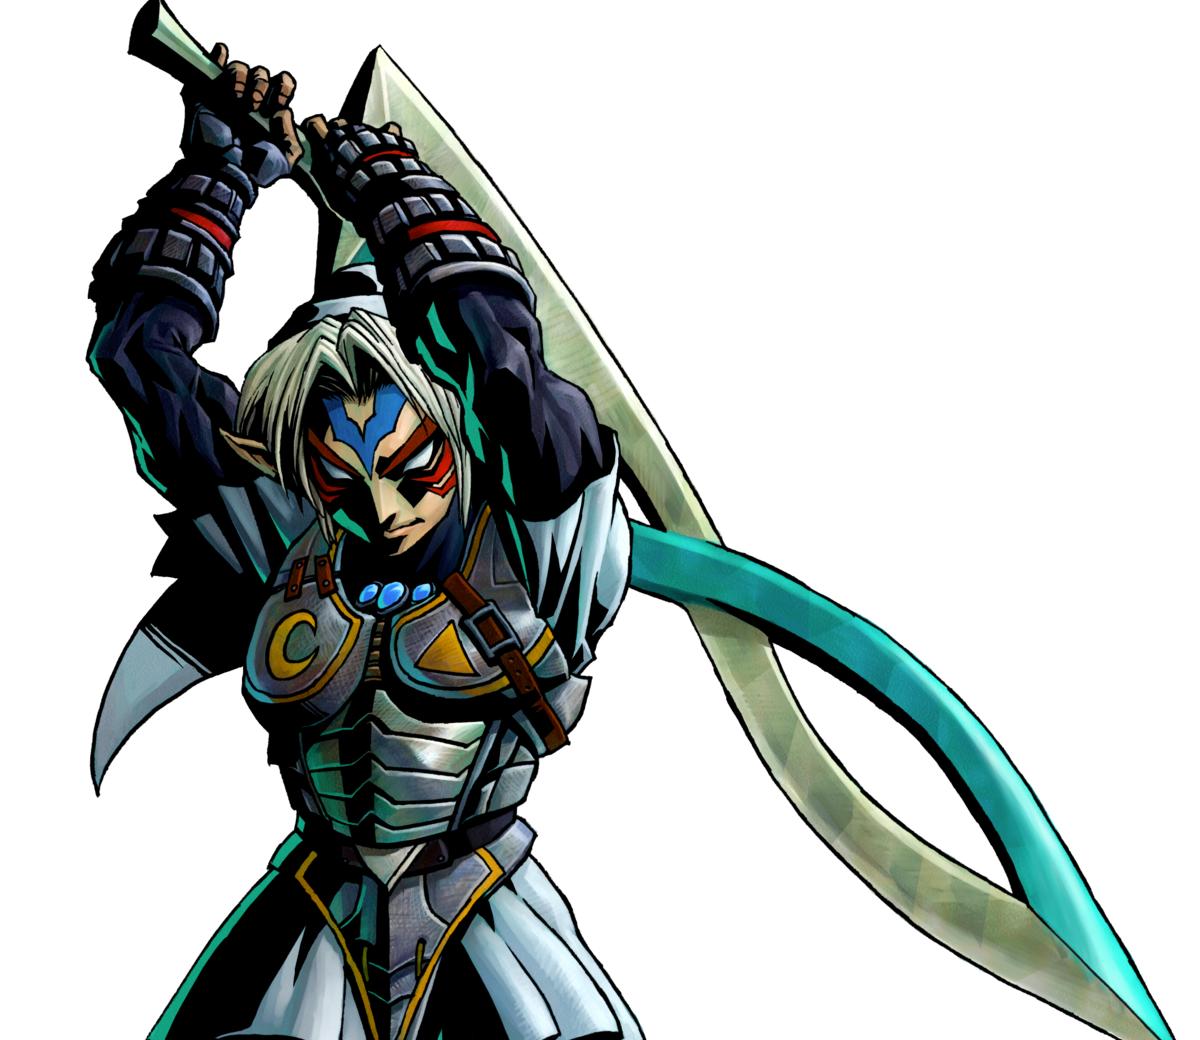 Fierce Deity Link and Sword